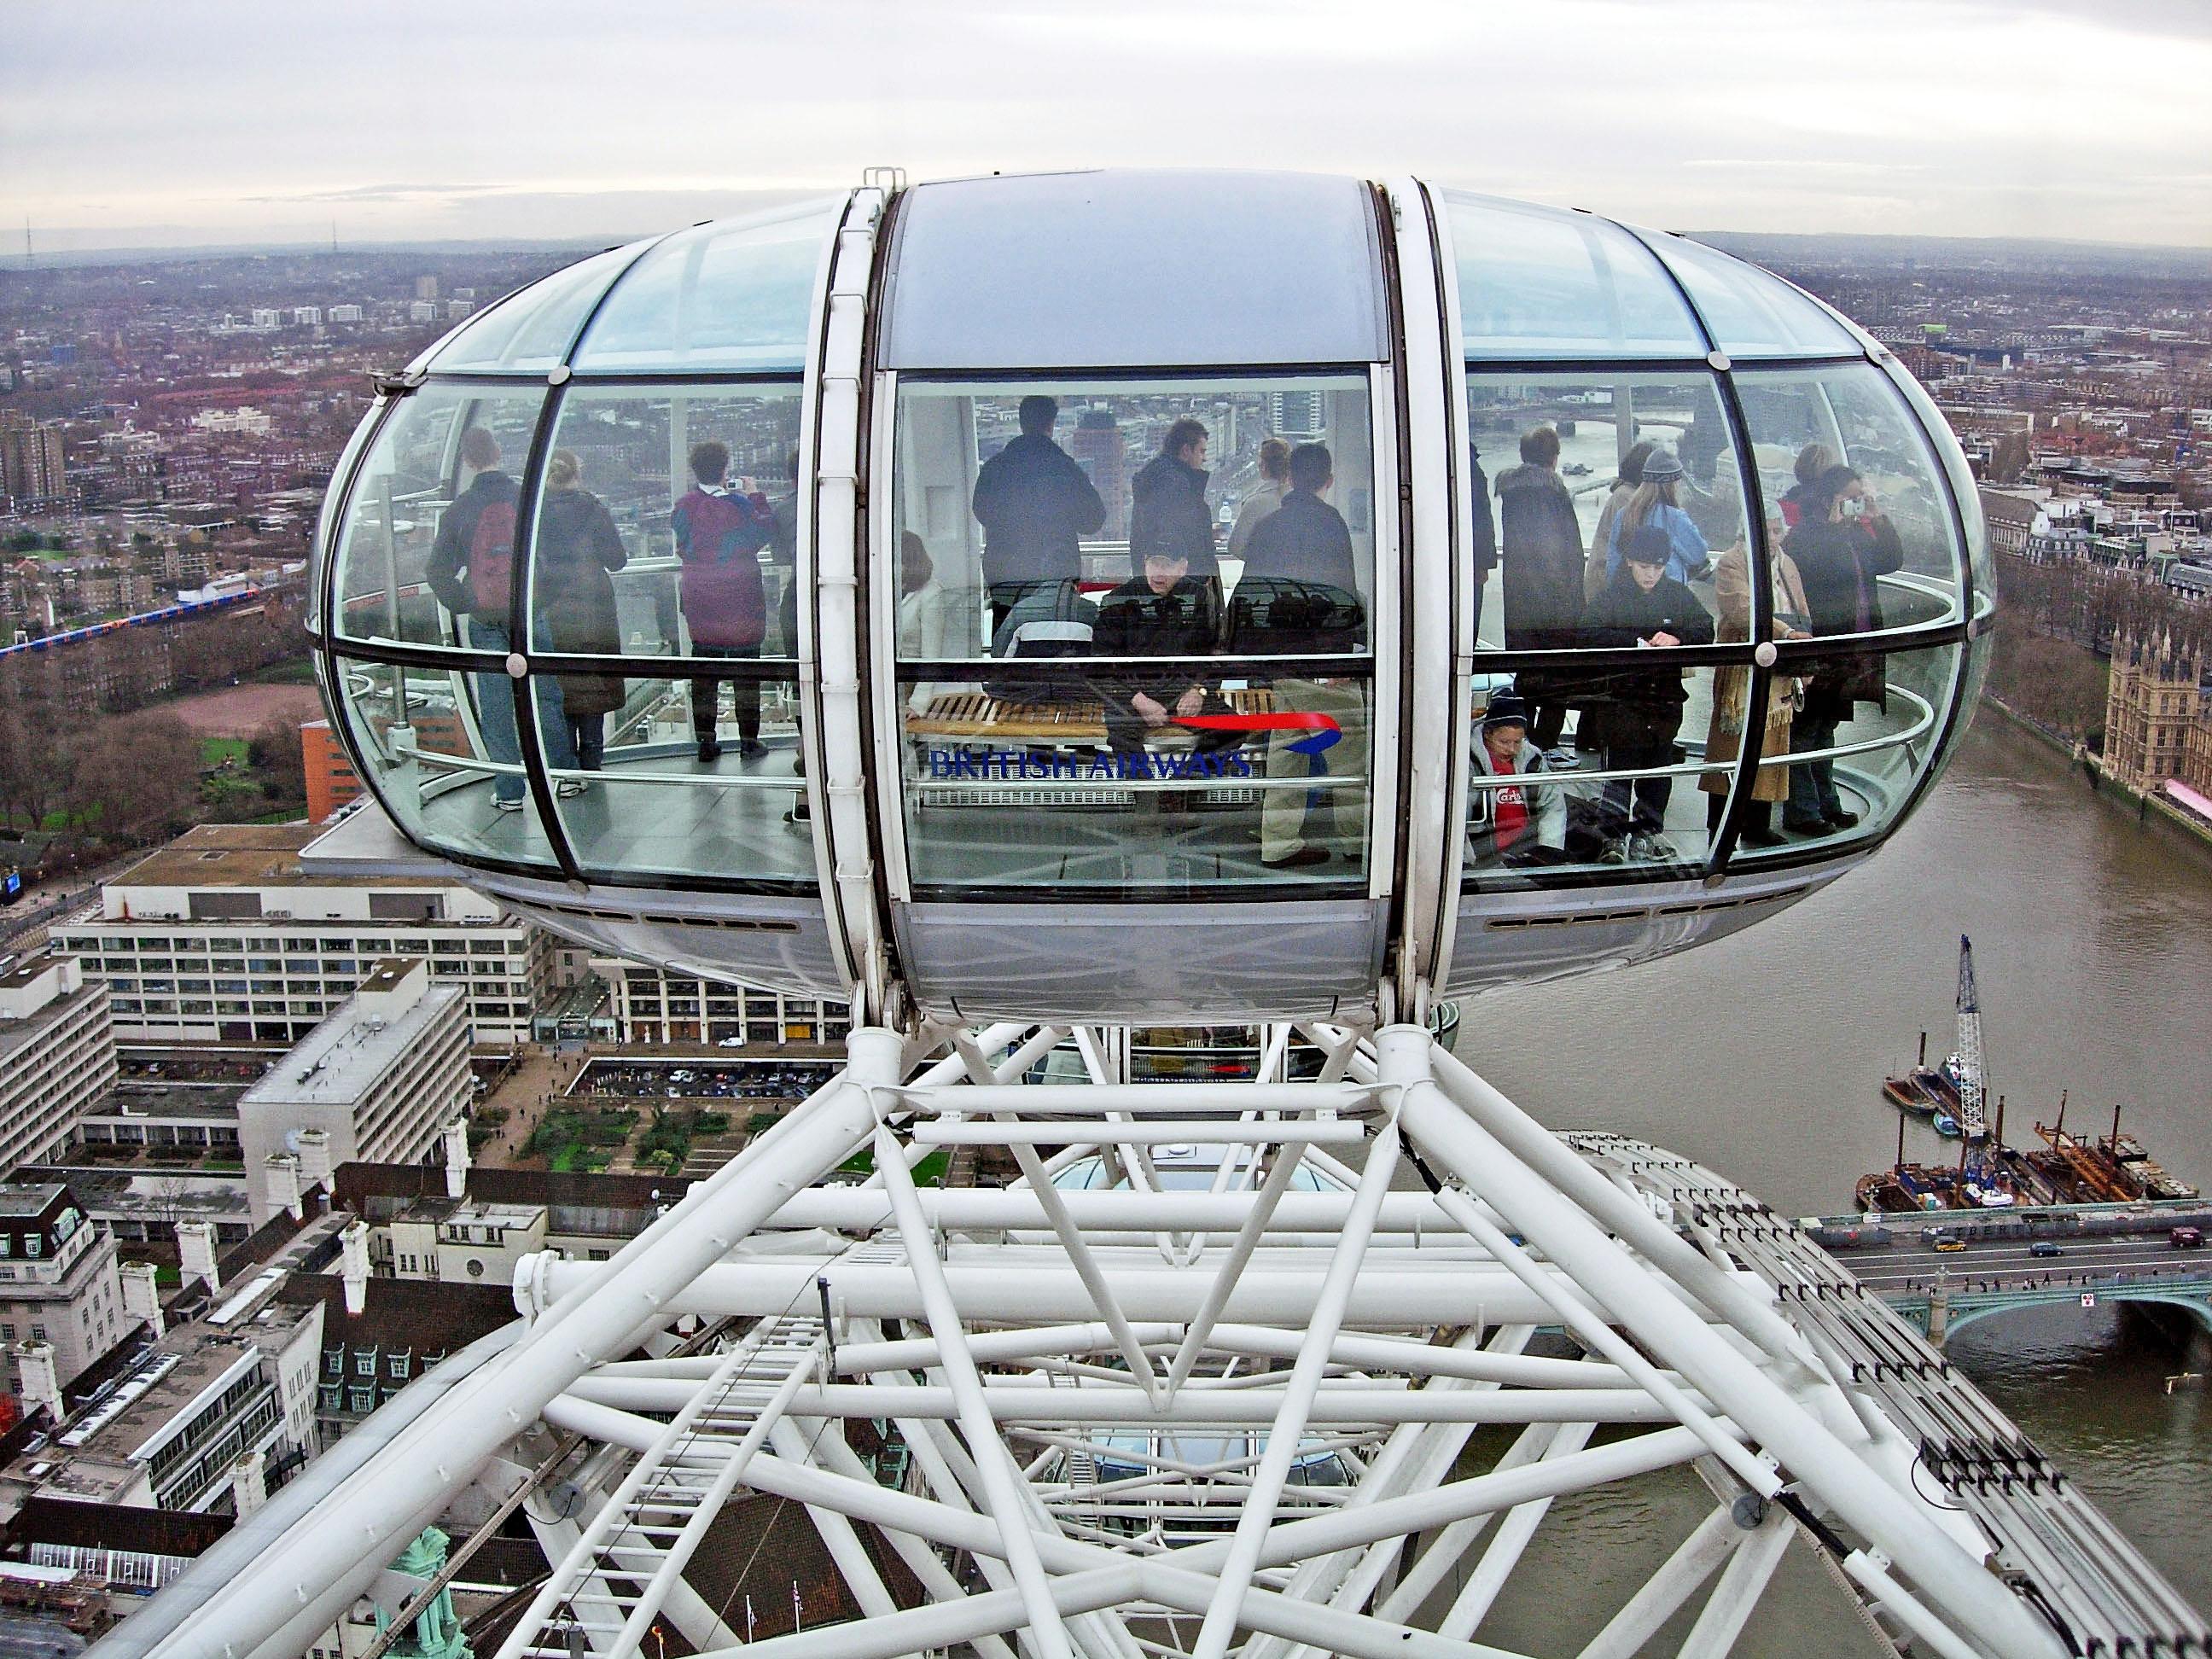 File:London Eye Pod.jpg - Wikimedia Commons